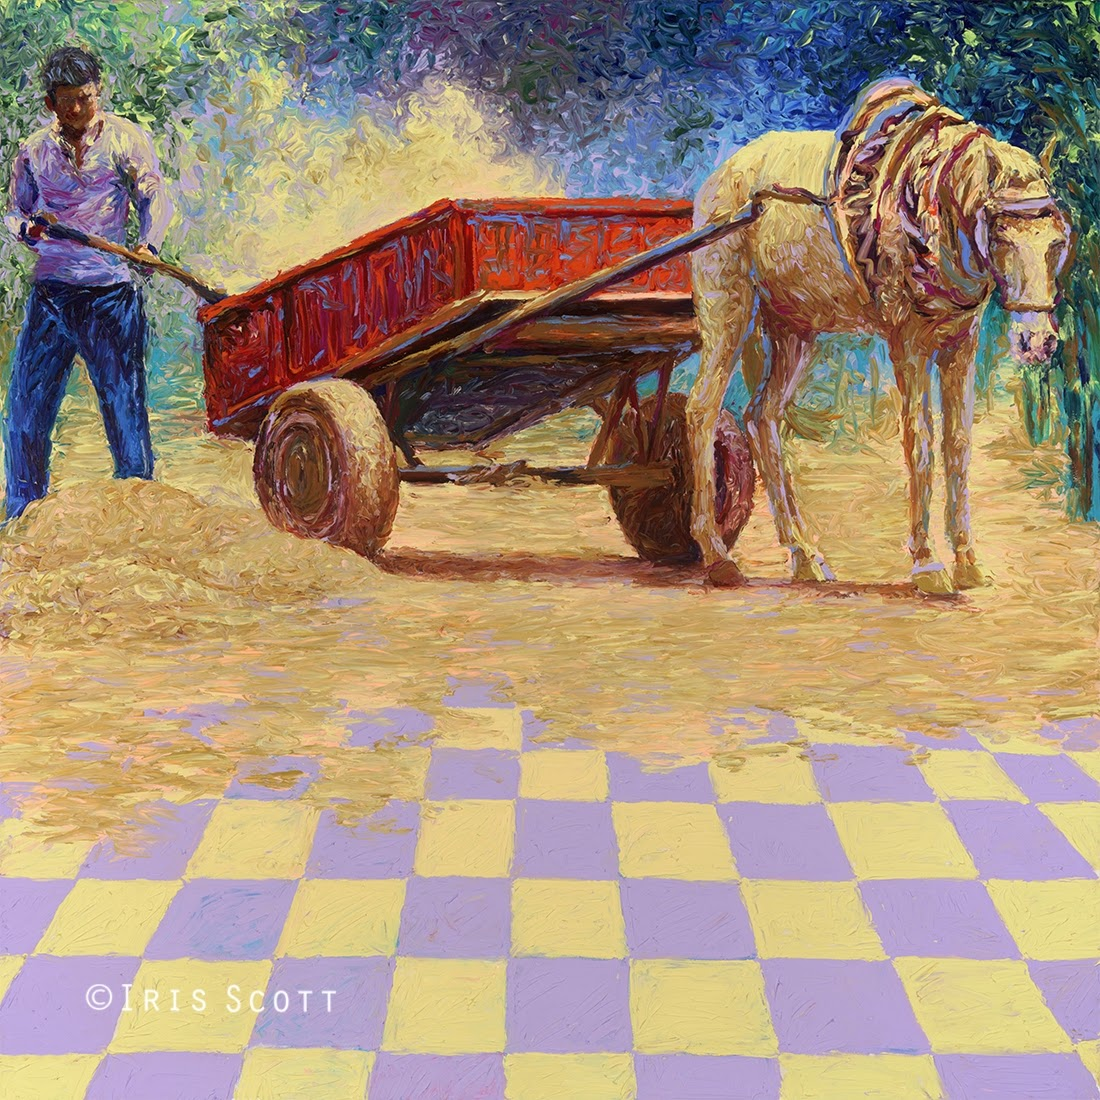 04-Dusty-Horse-Cart-Iris-Scott-Finger-Painting-Fine-Art-www-designstack-co